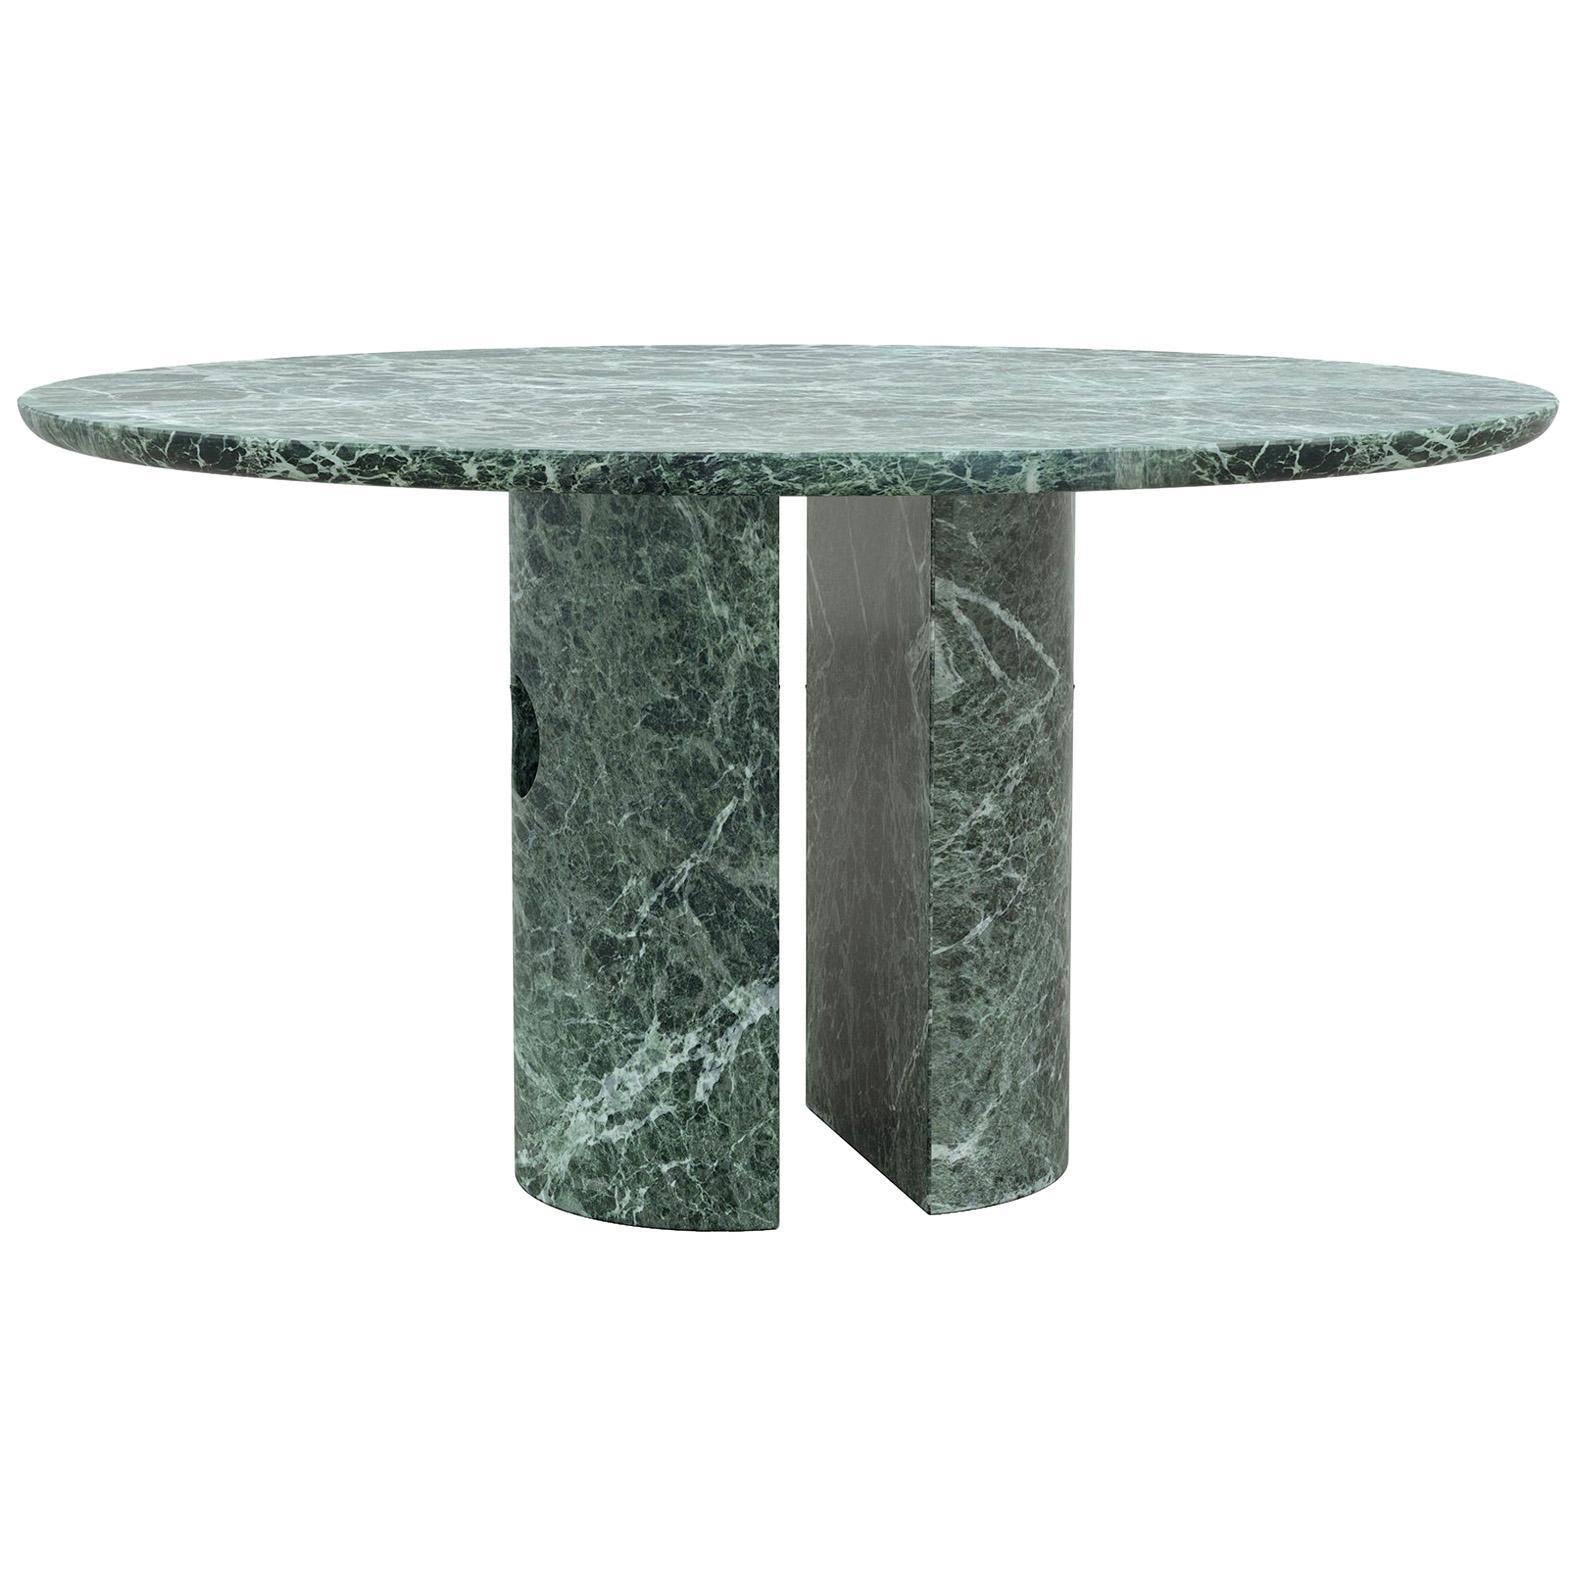 Circular Green Marble Meta Dining Table by Phillip Jividen